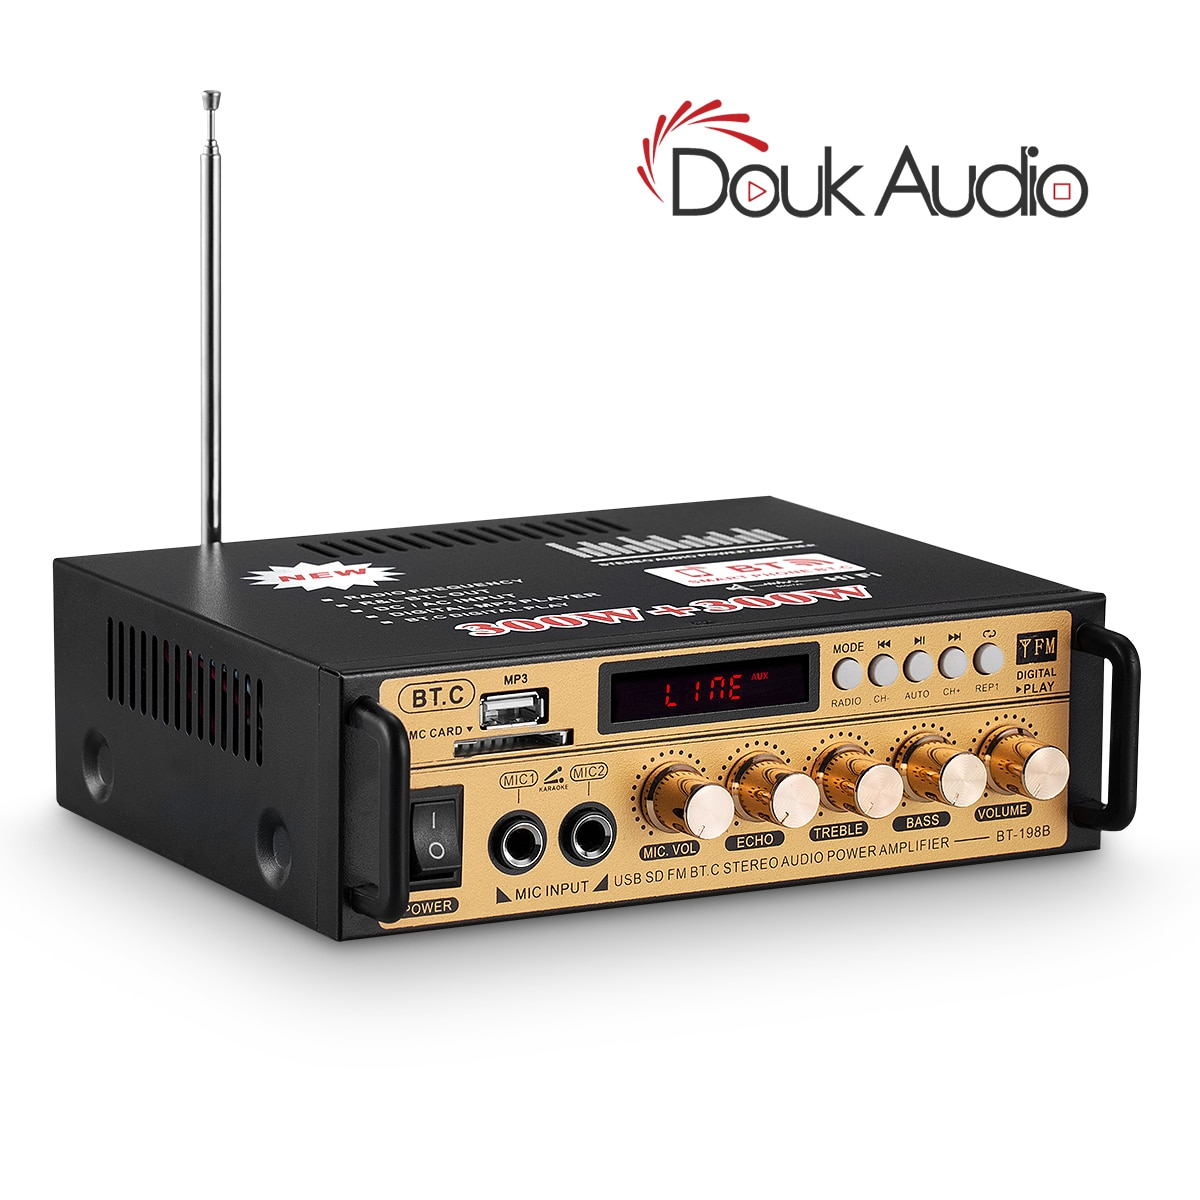 Amplificador Digital de Audio Douk, receptor Bluetooth, Audio estéreo Casero/coche/energía marina, tarjeta SD sin pérdidas/reproductor de música USB